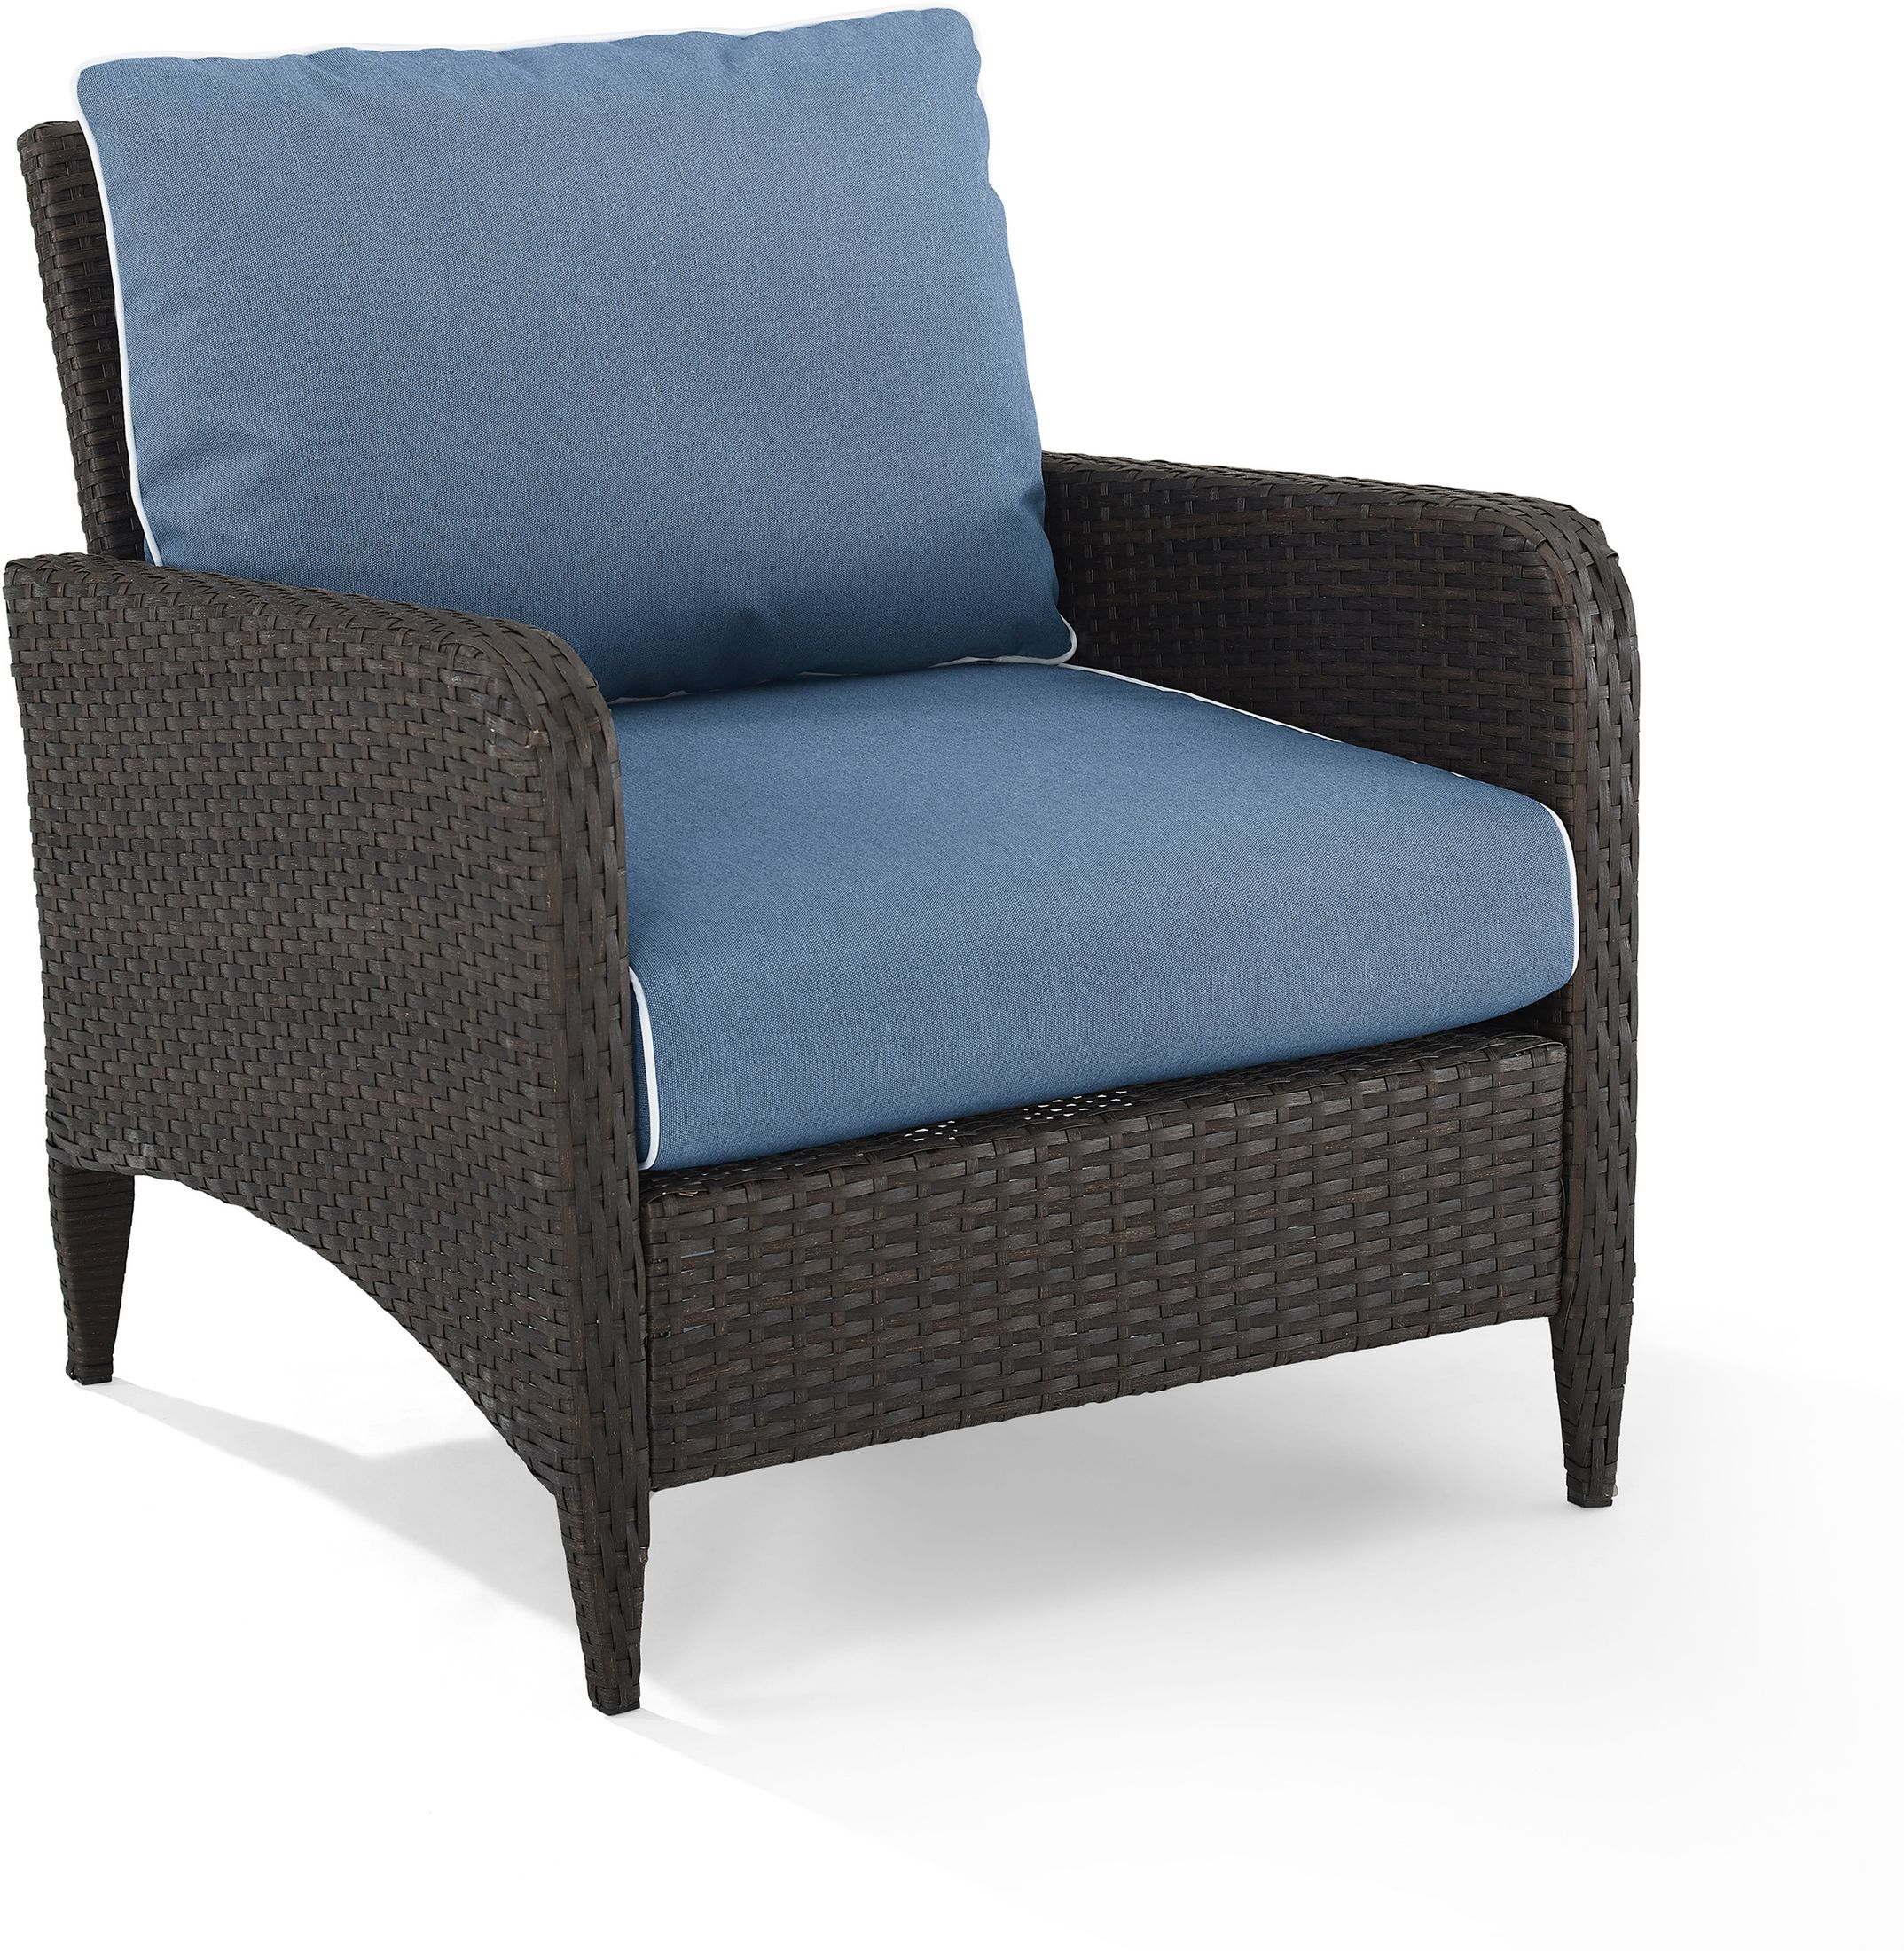 Outdoor Furniture - Corona Outdoor Chair